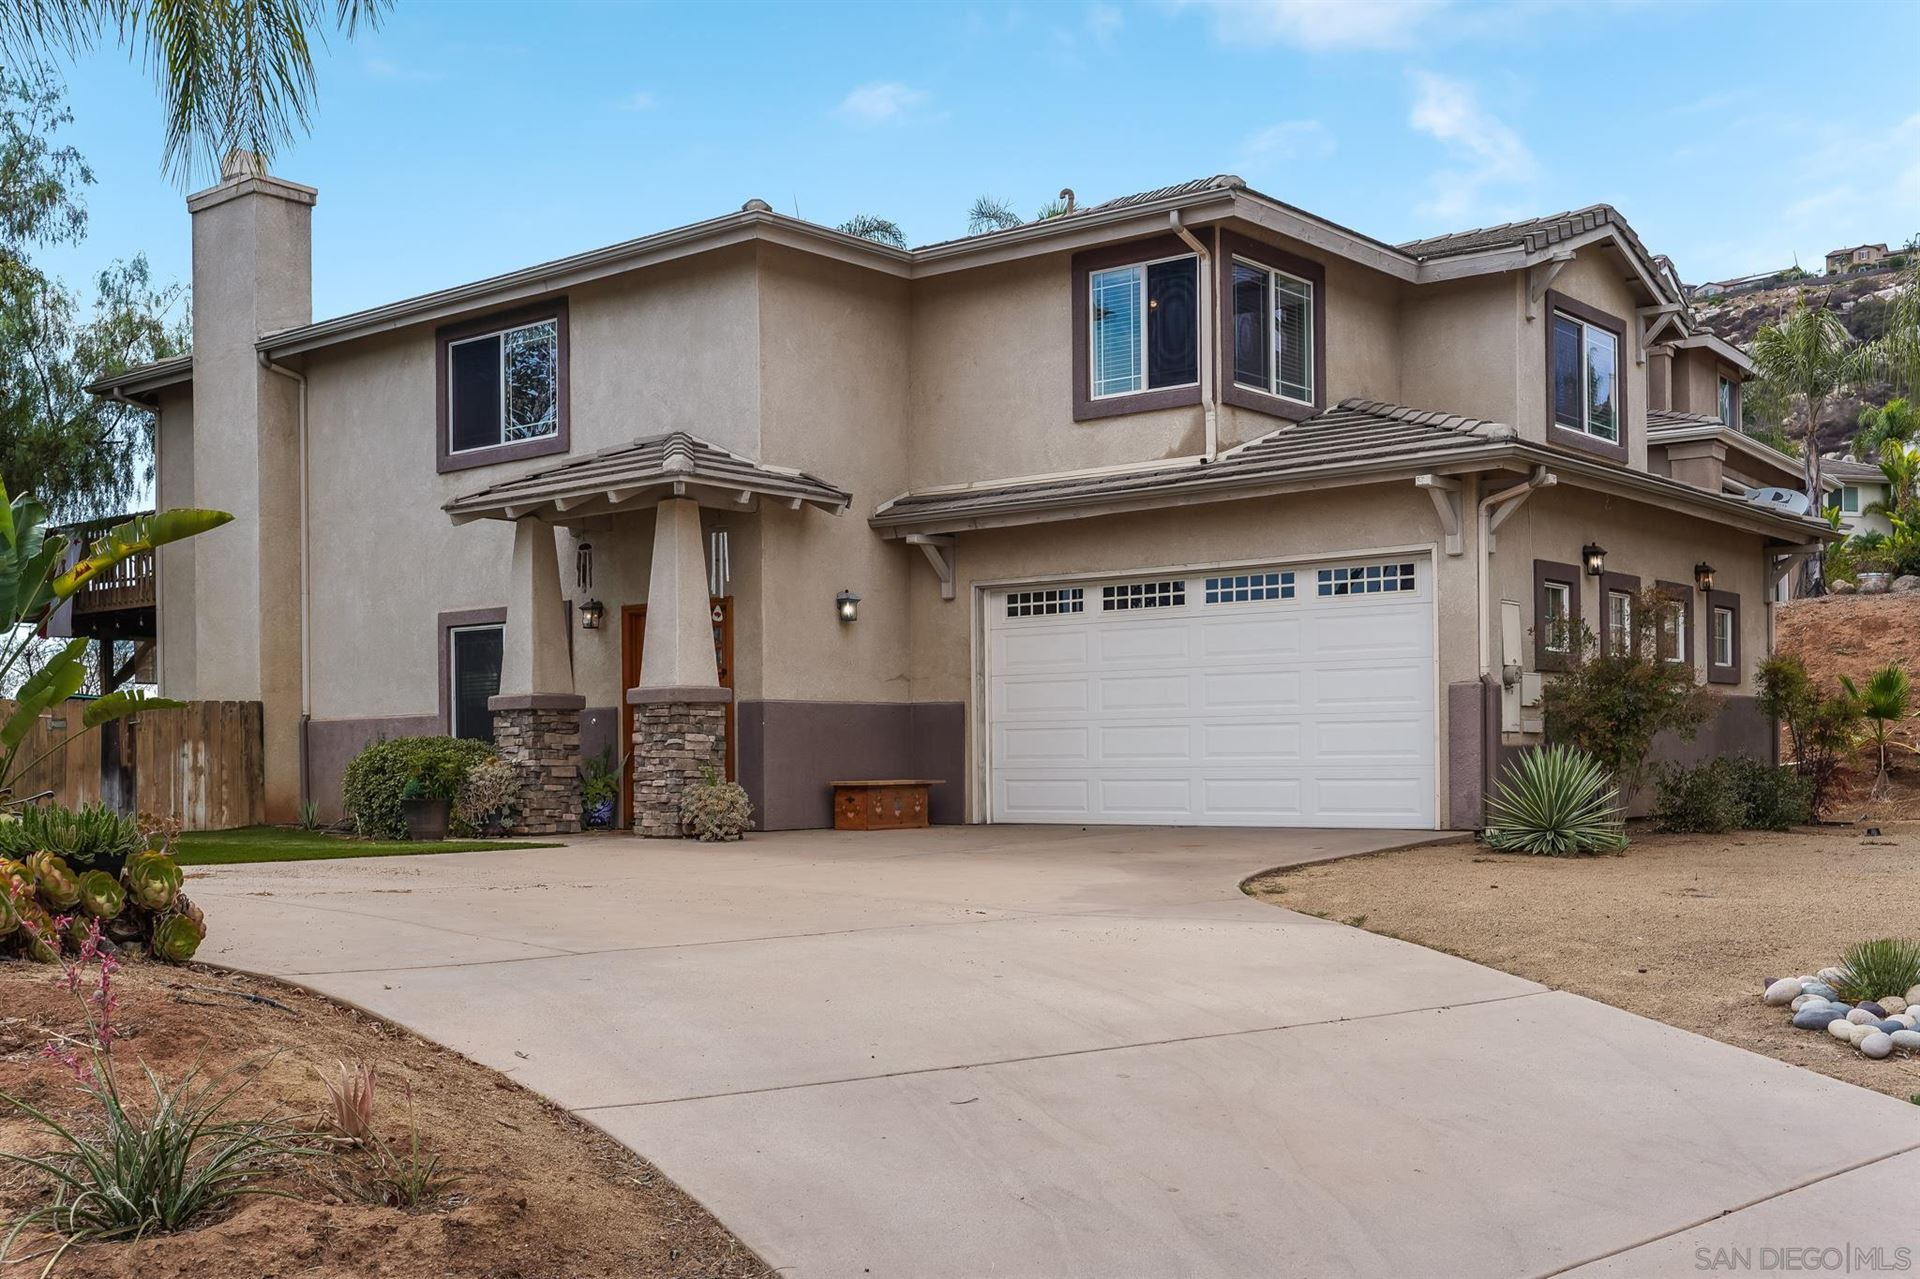 Photo of 8404 Sheila Street, El Cajon, CA 92021 (MLS # 210020176)